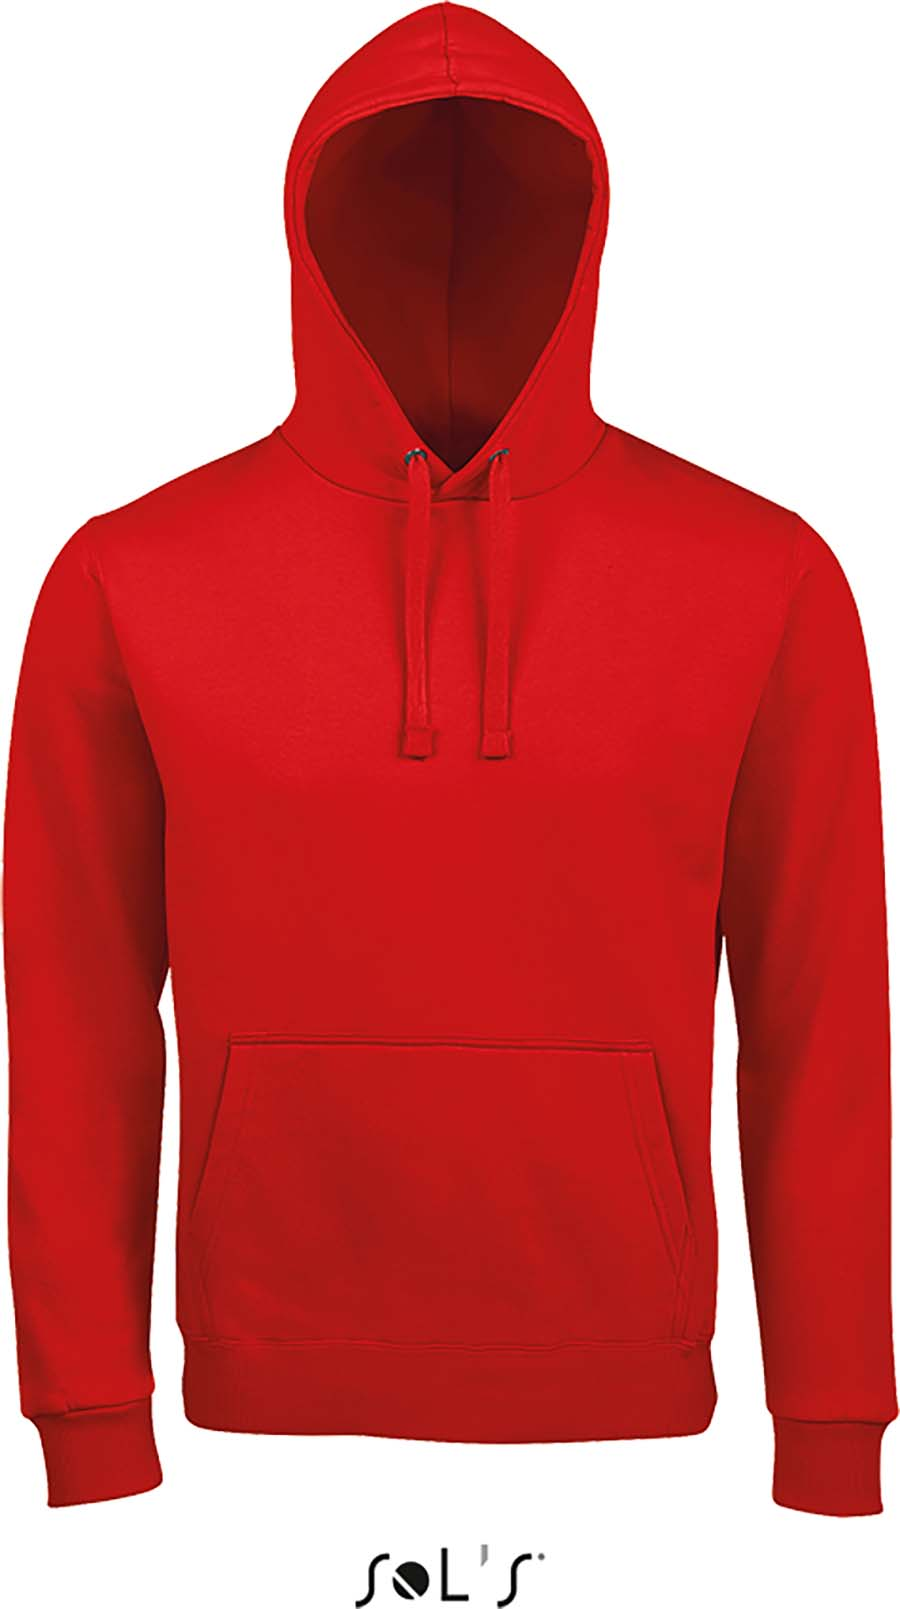 Sweat-shirt unisexe à capuche - 1-1403-4